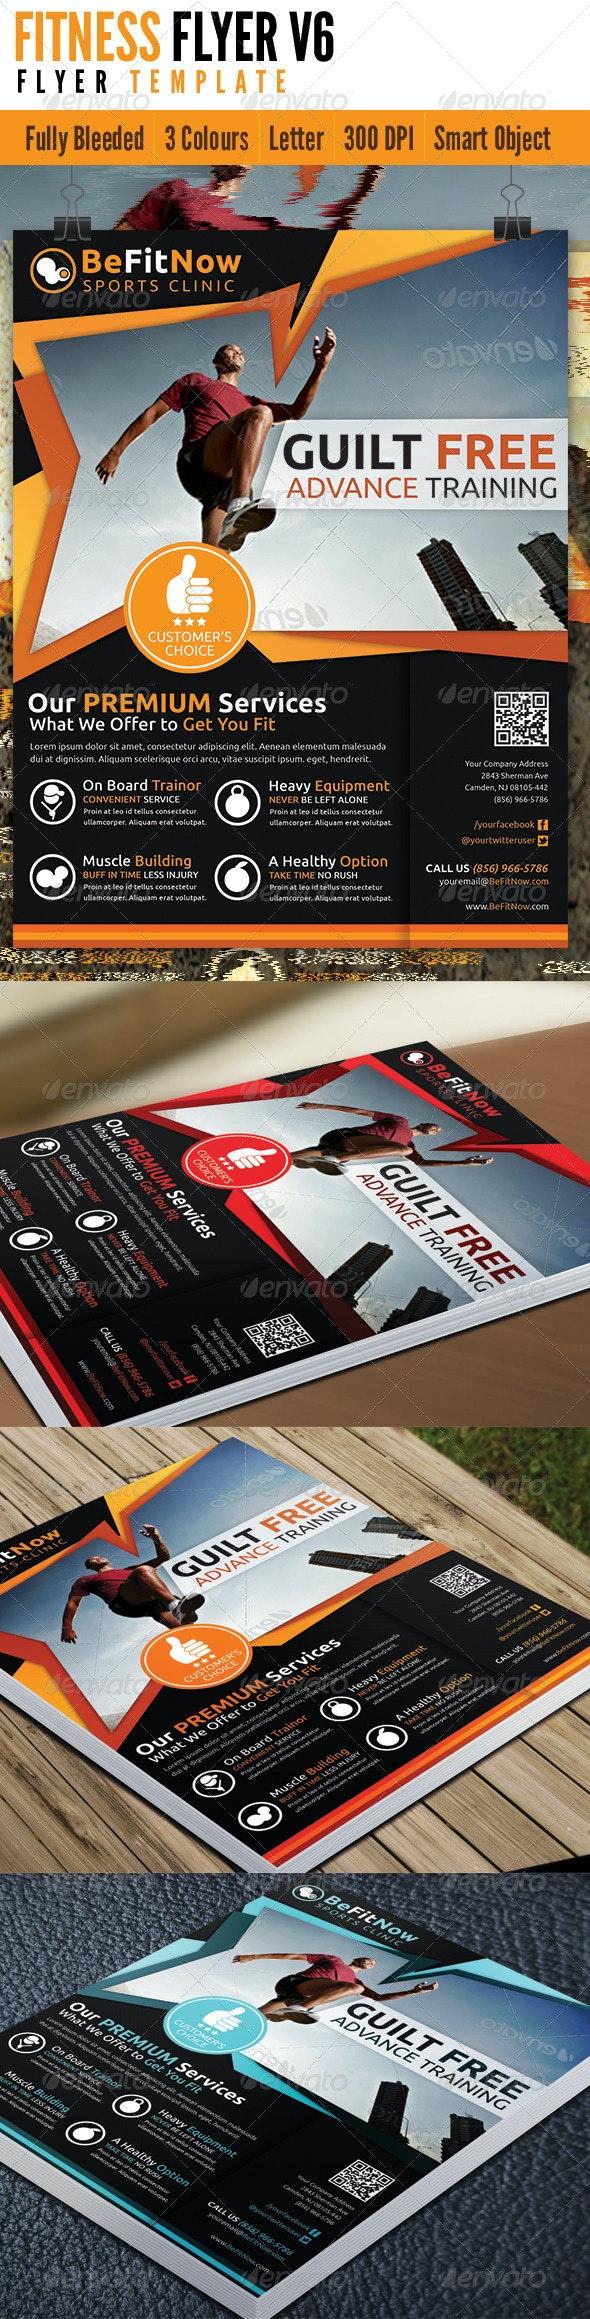 Fitness Flyer V6 - Flyers Print Templates